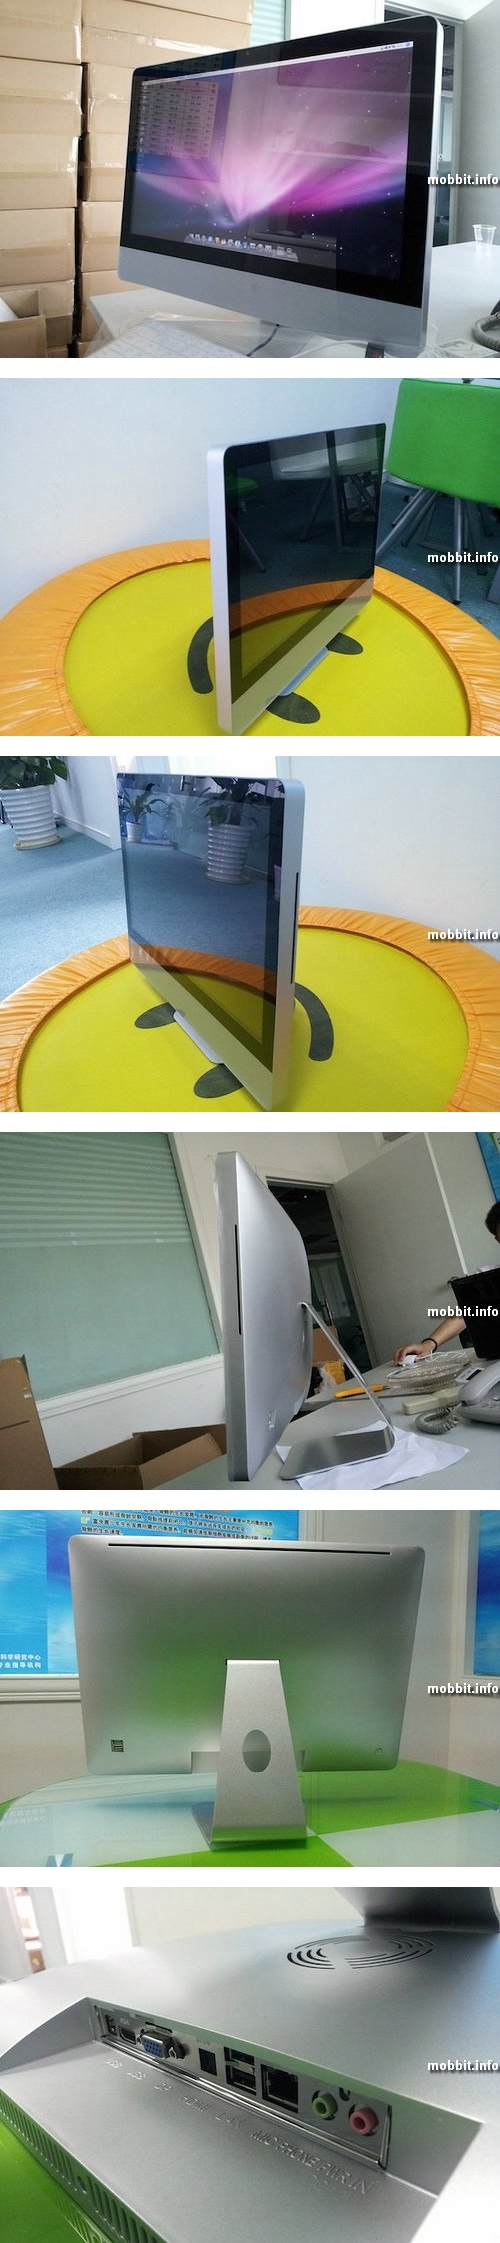 Китайский клон iMac